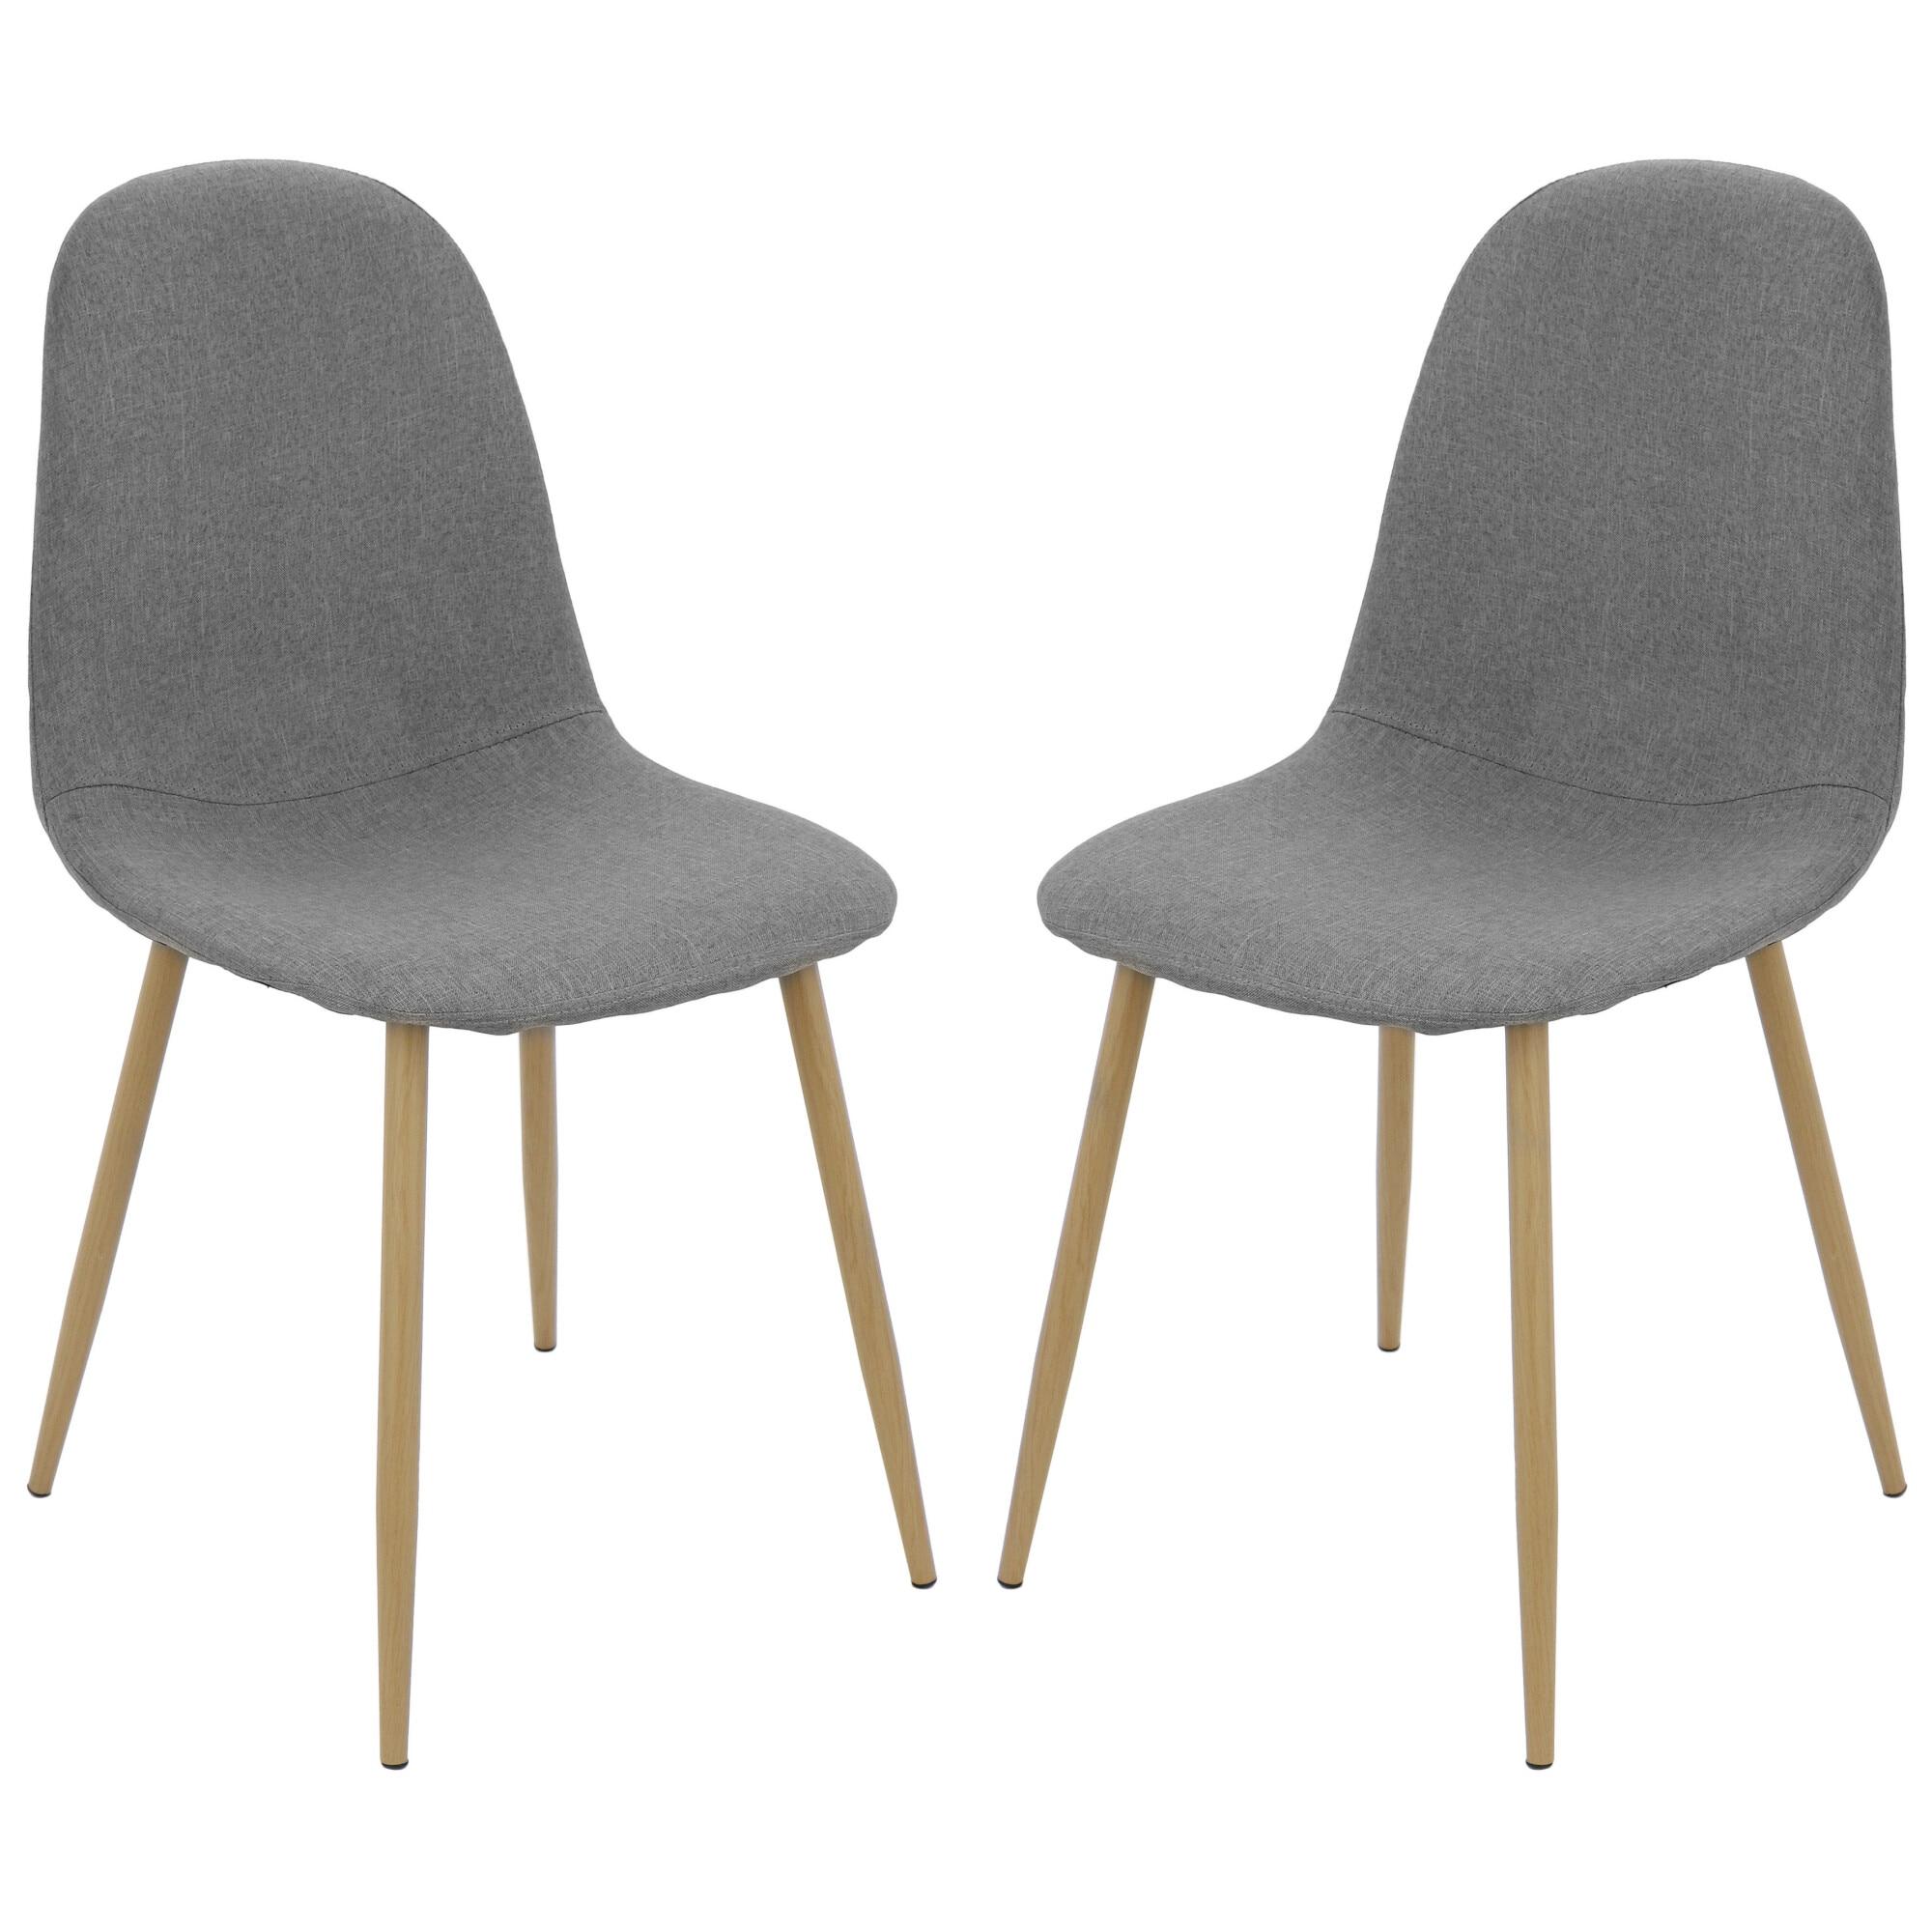 Fotografie Set 2 scaune Kring Panama, material textil, Gri